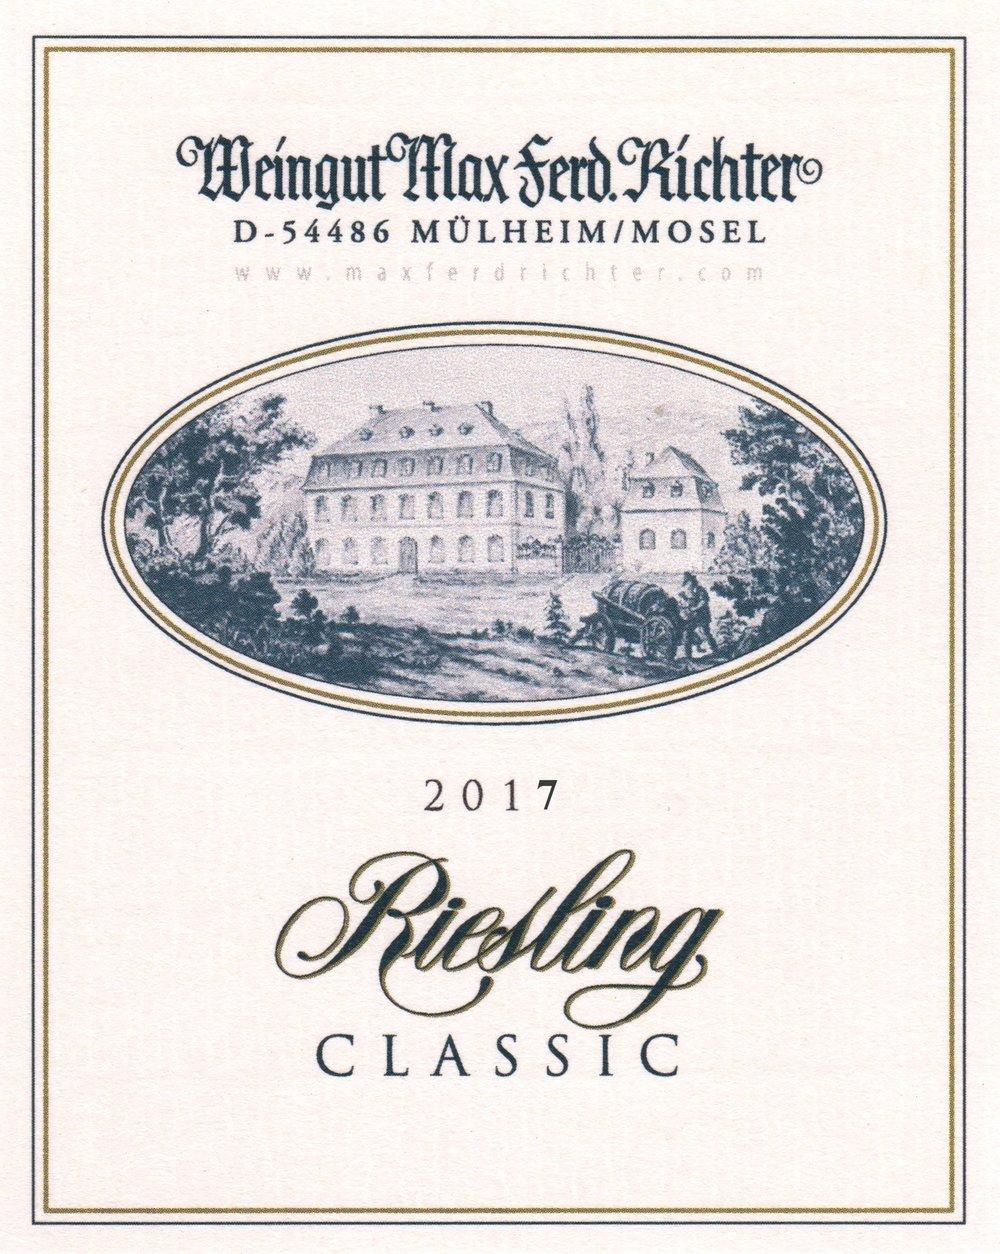 2017 Classic, Qualitätswein.jpg